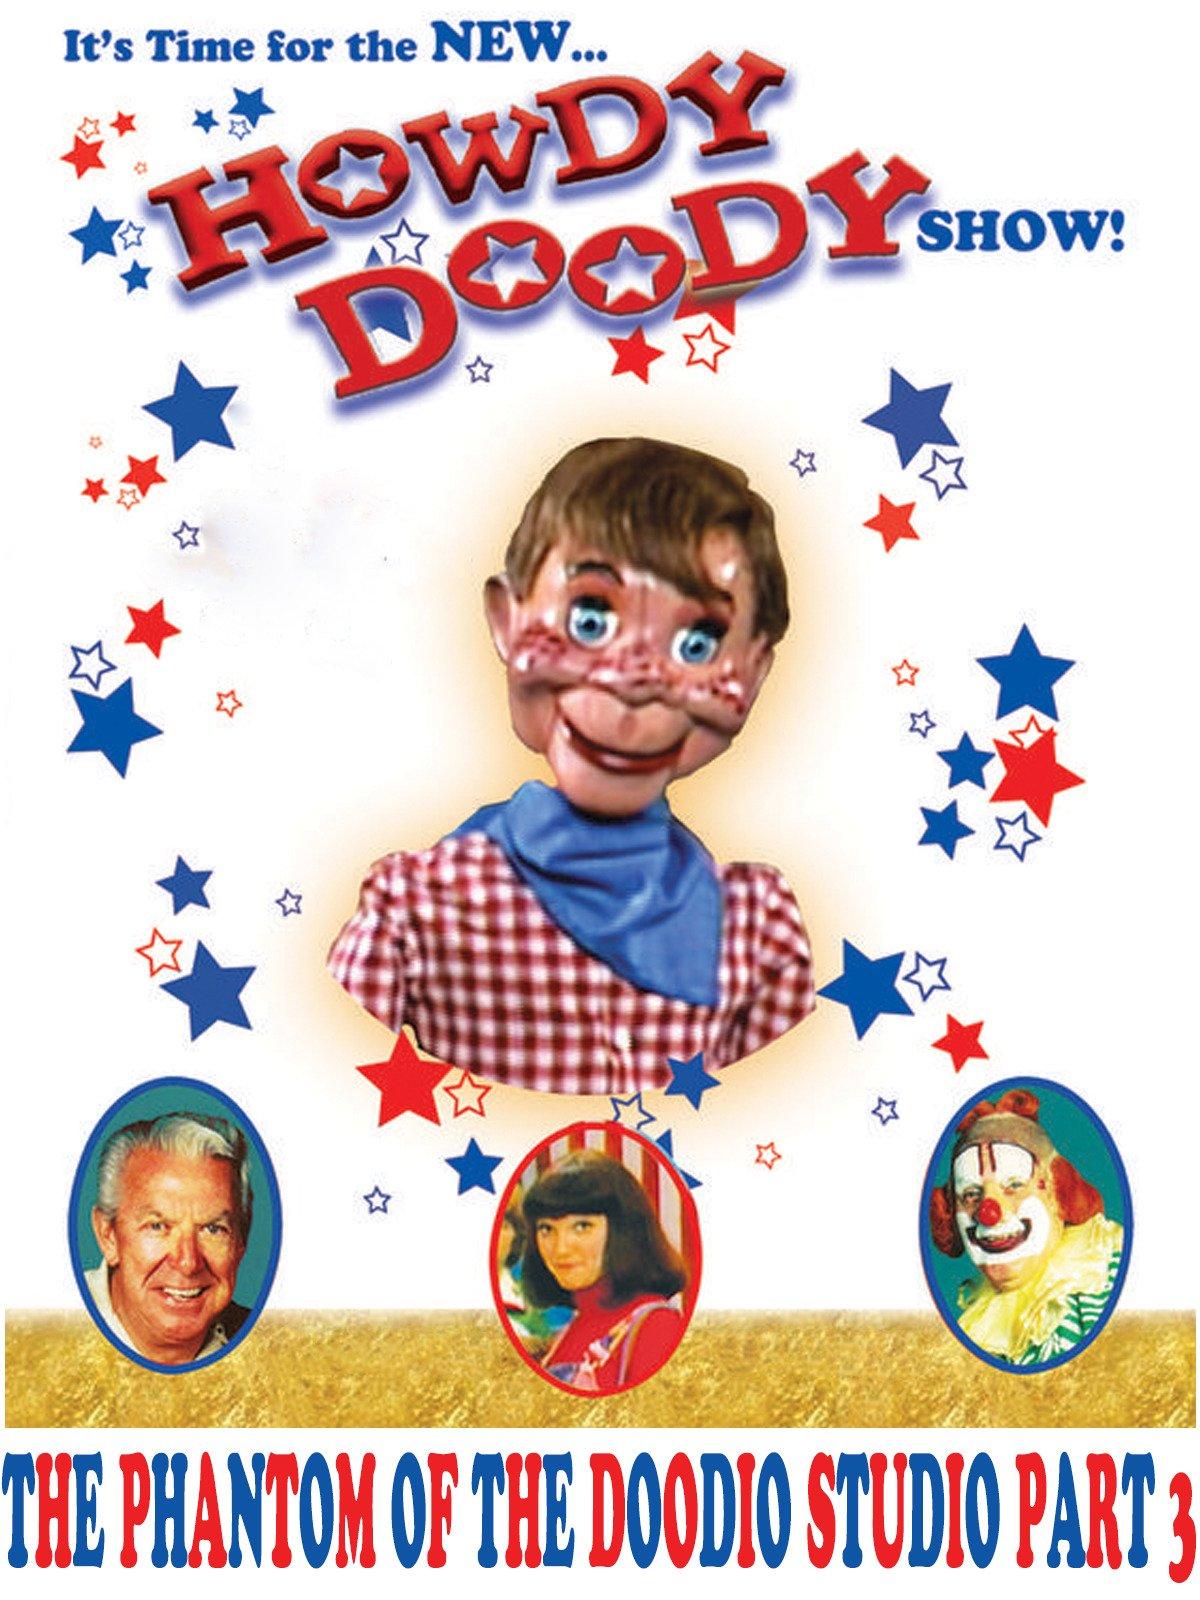 The New Howdy Doody Show The Phantom Of Doody O Studio Part 3